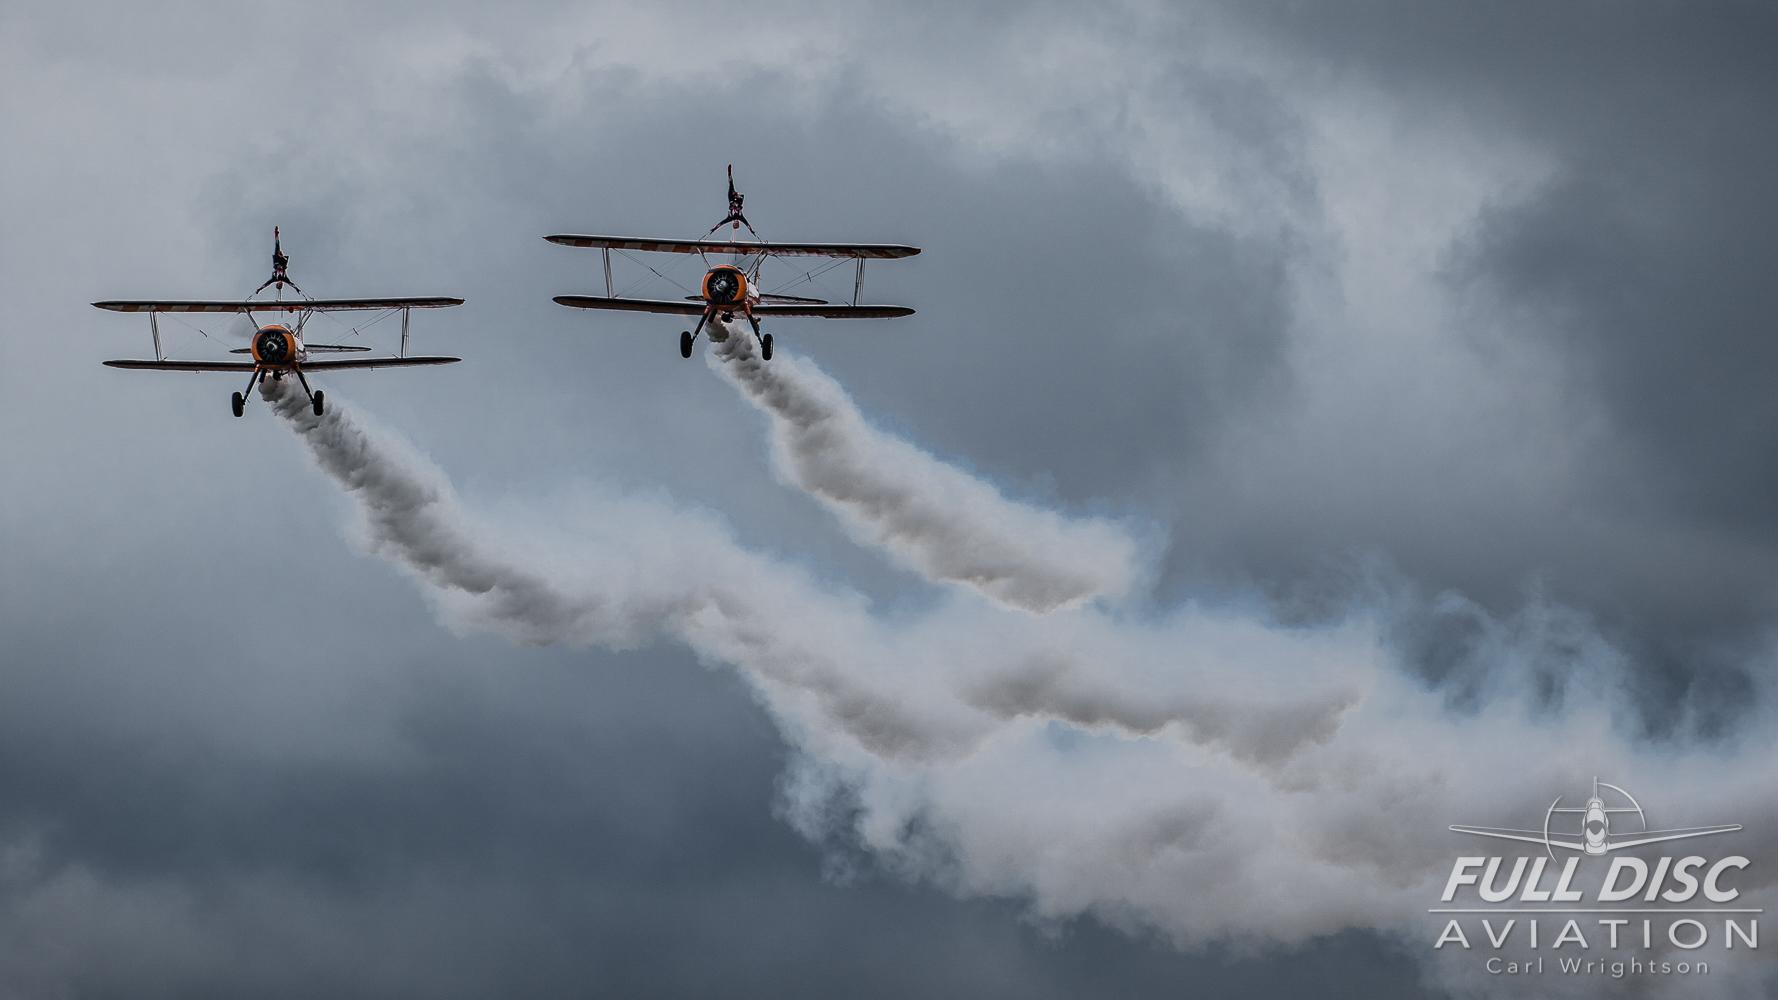 Duxford Air Festival_FullDiscAviation_CarlWrightston-May 26, 2019-35.jpg